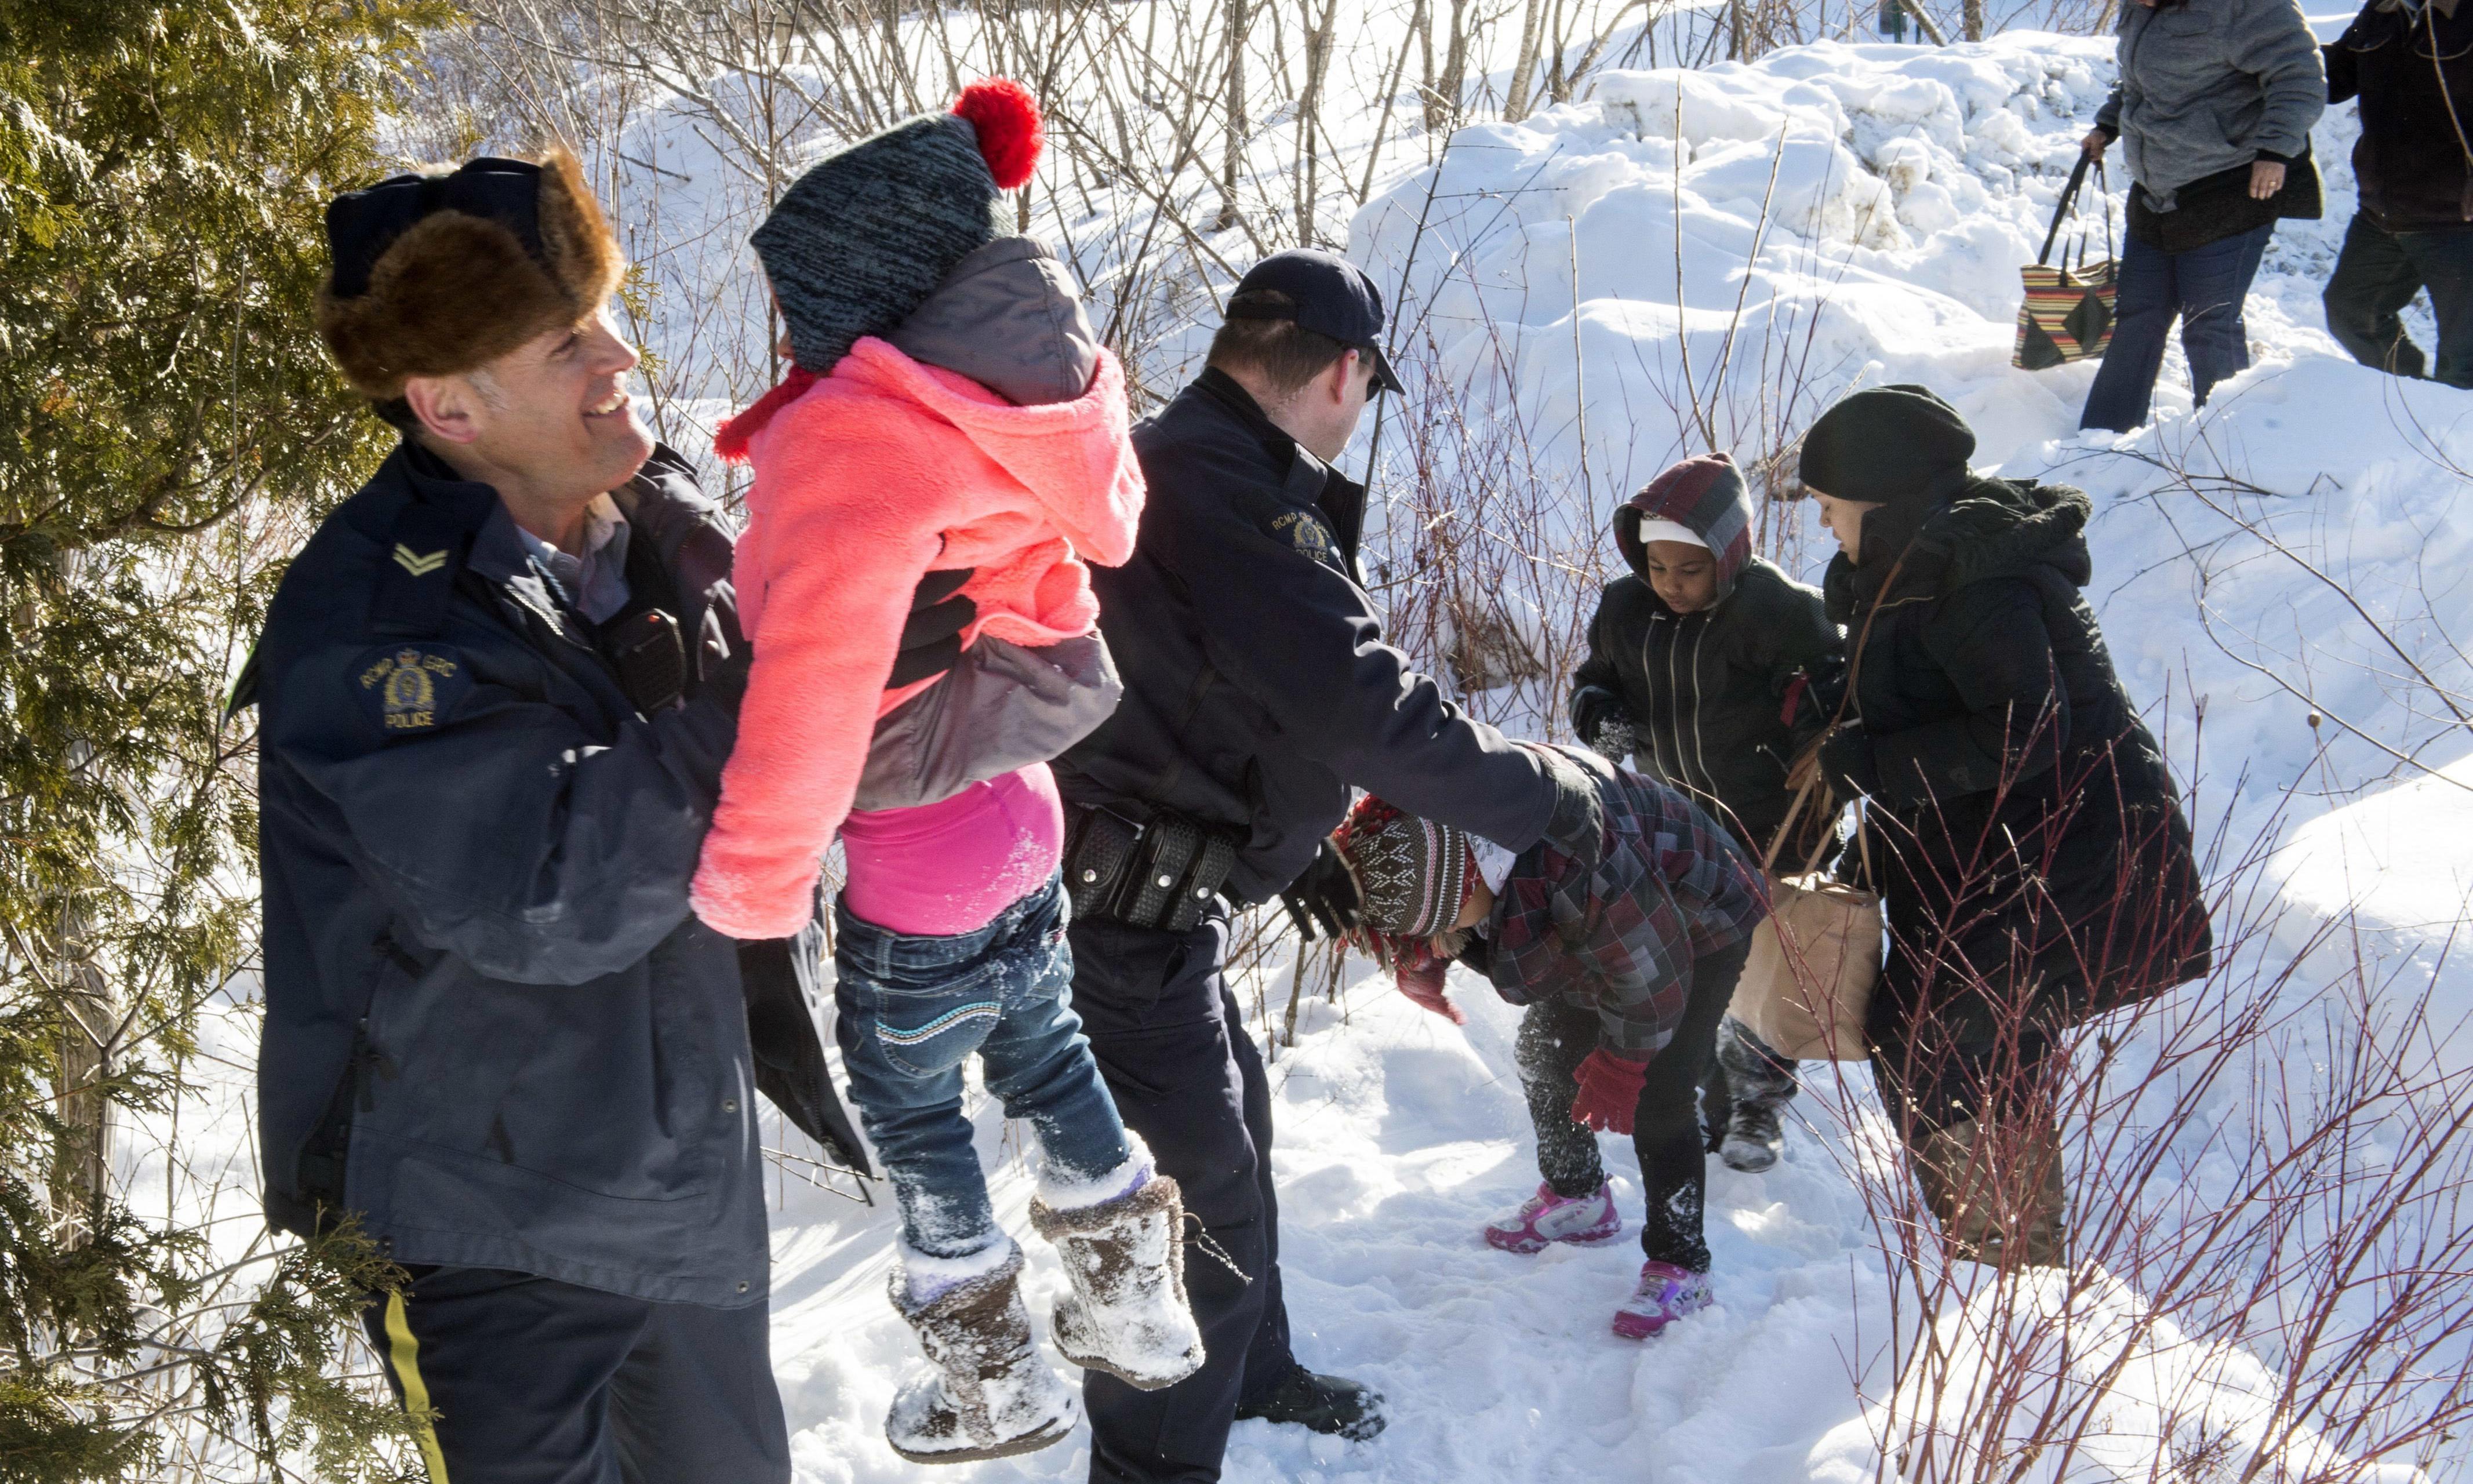 Canada registers sixfold increase in US citizens seeking asylum in 2017